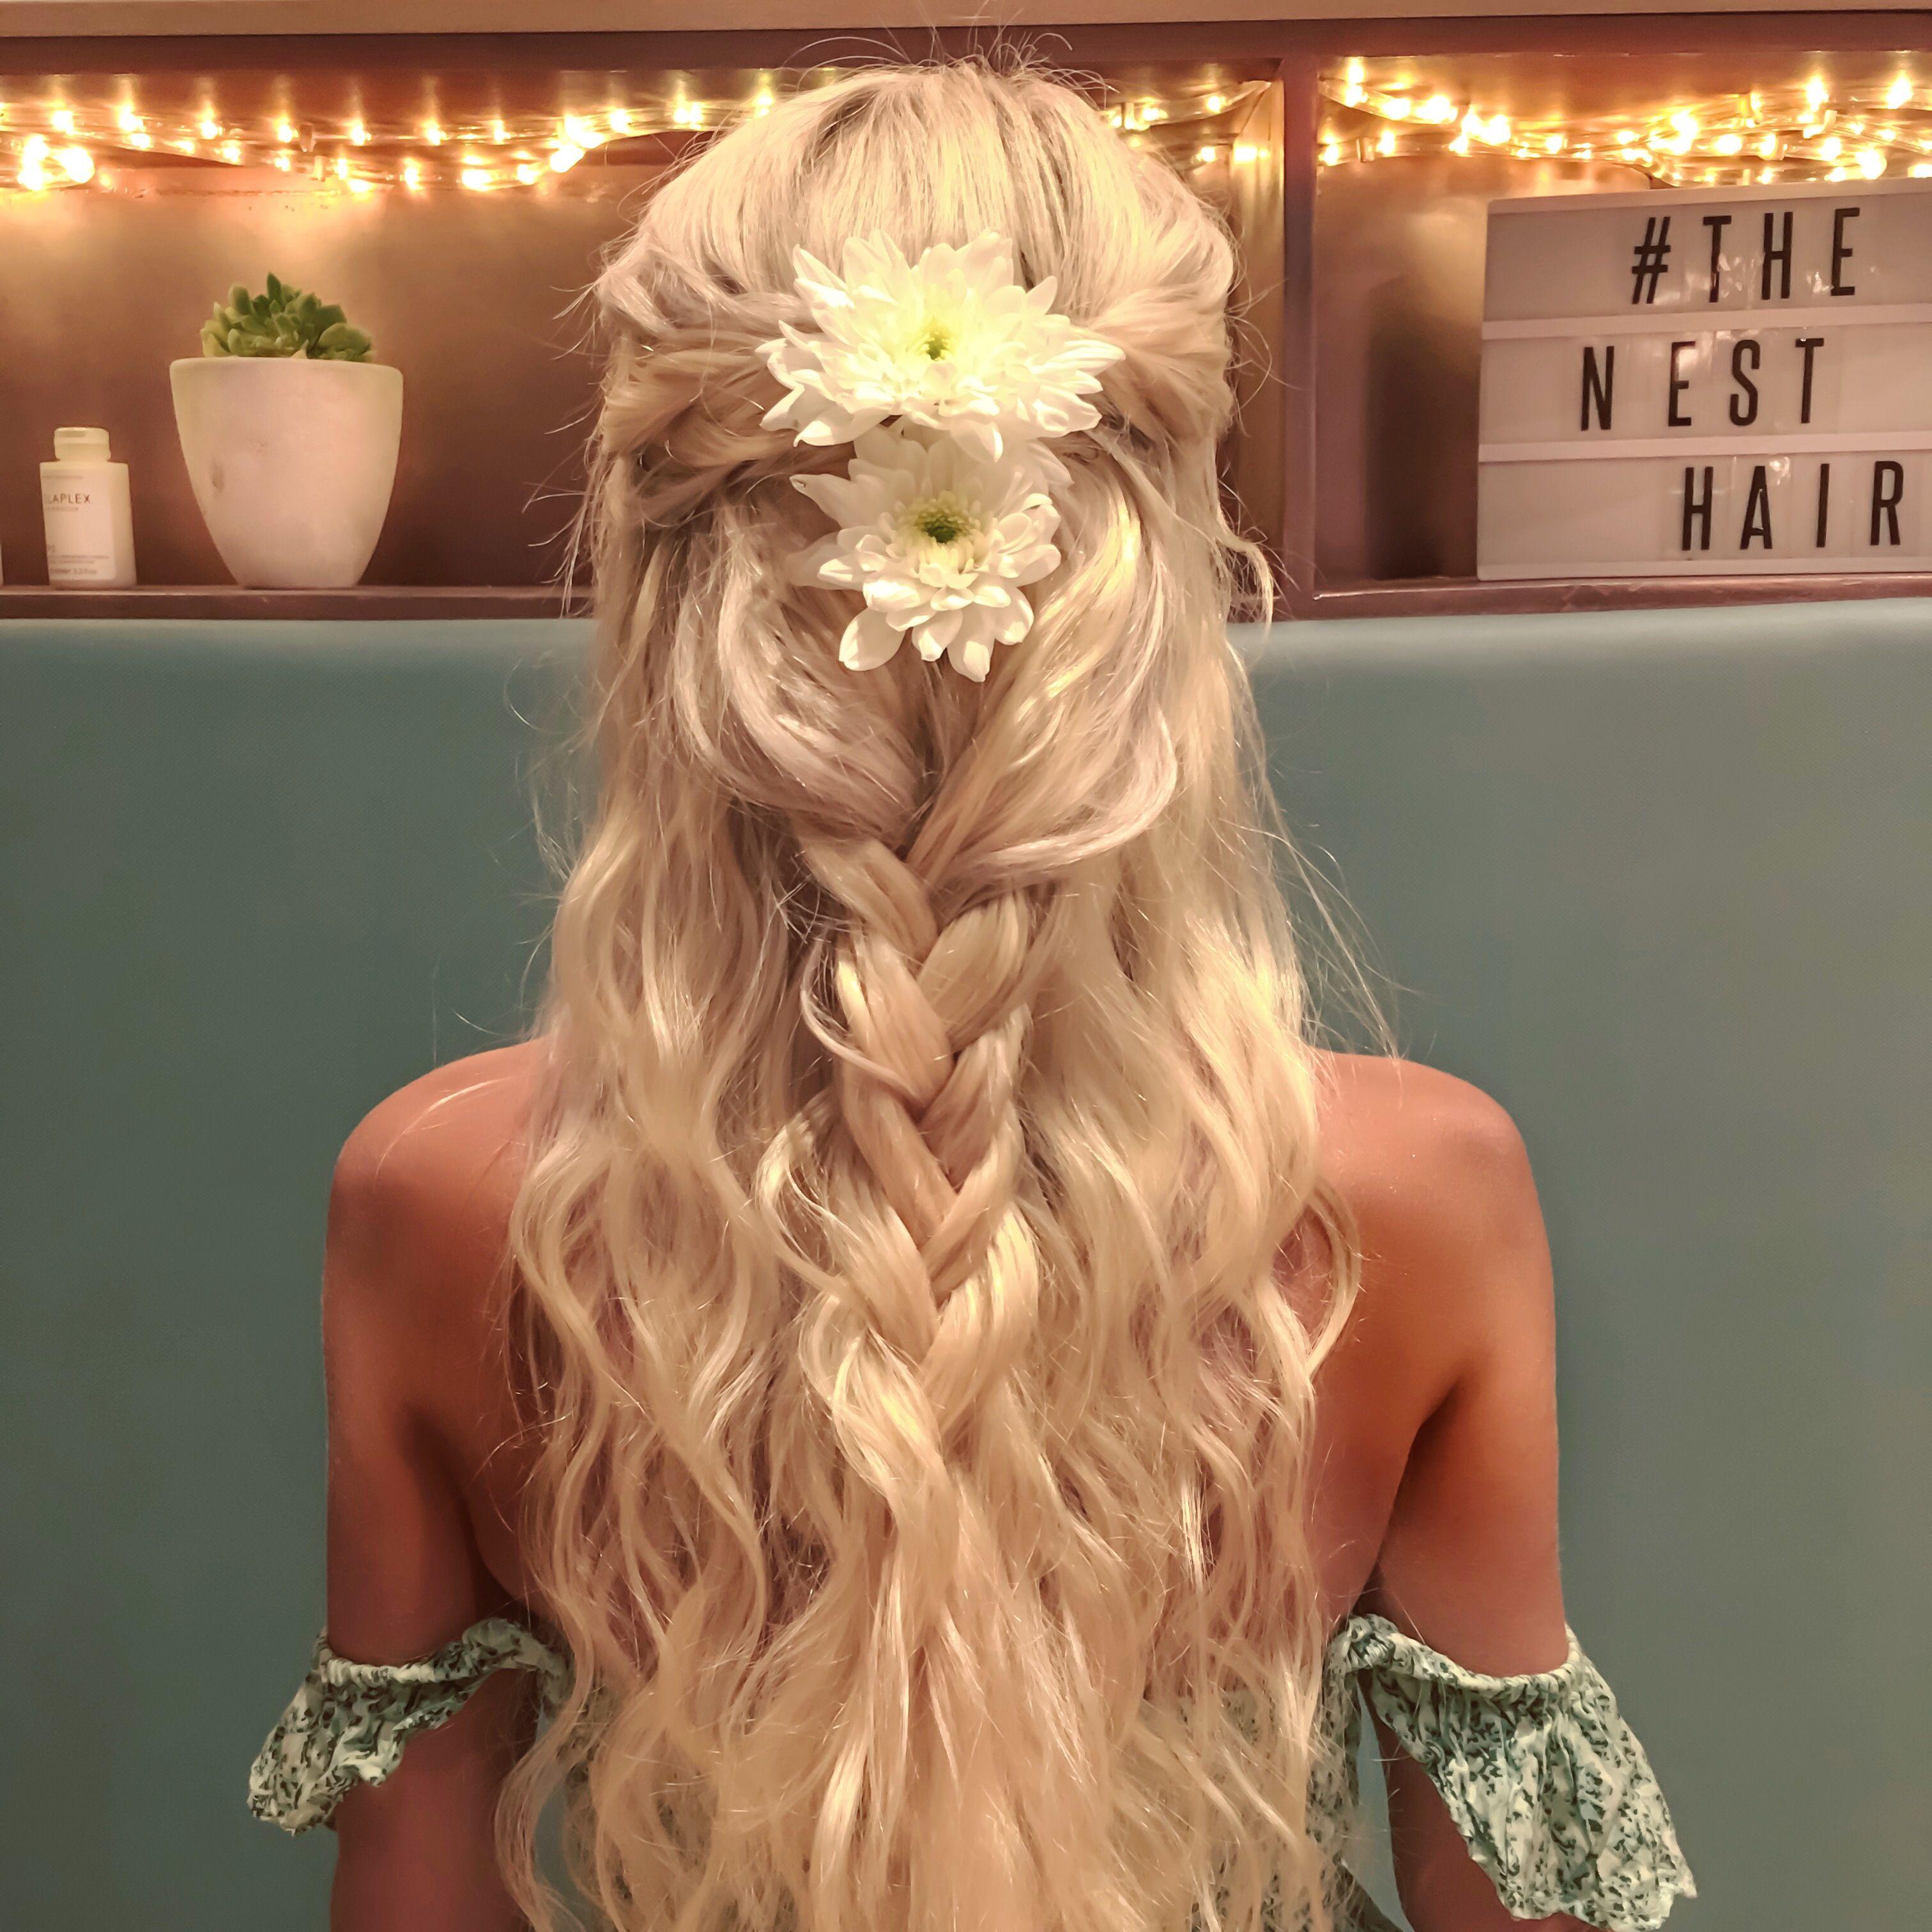 GypsyLovinLight Mermaid Hair ✨ PC The Nest Hair Boutique Perth